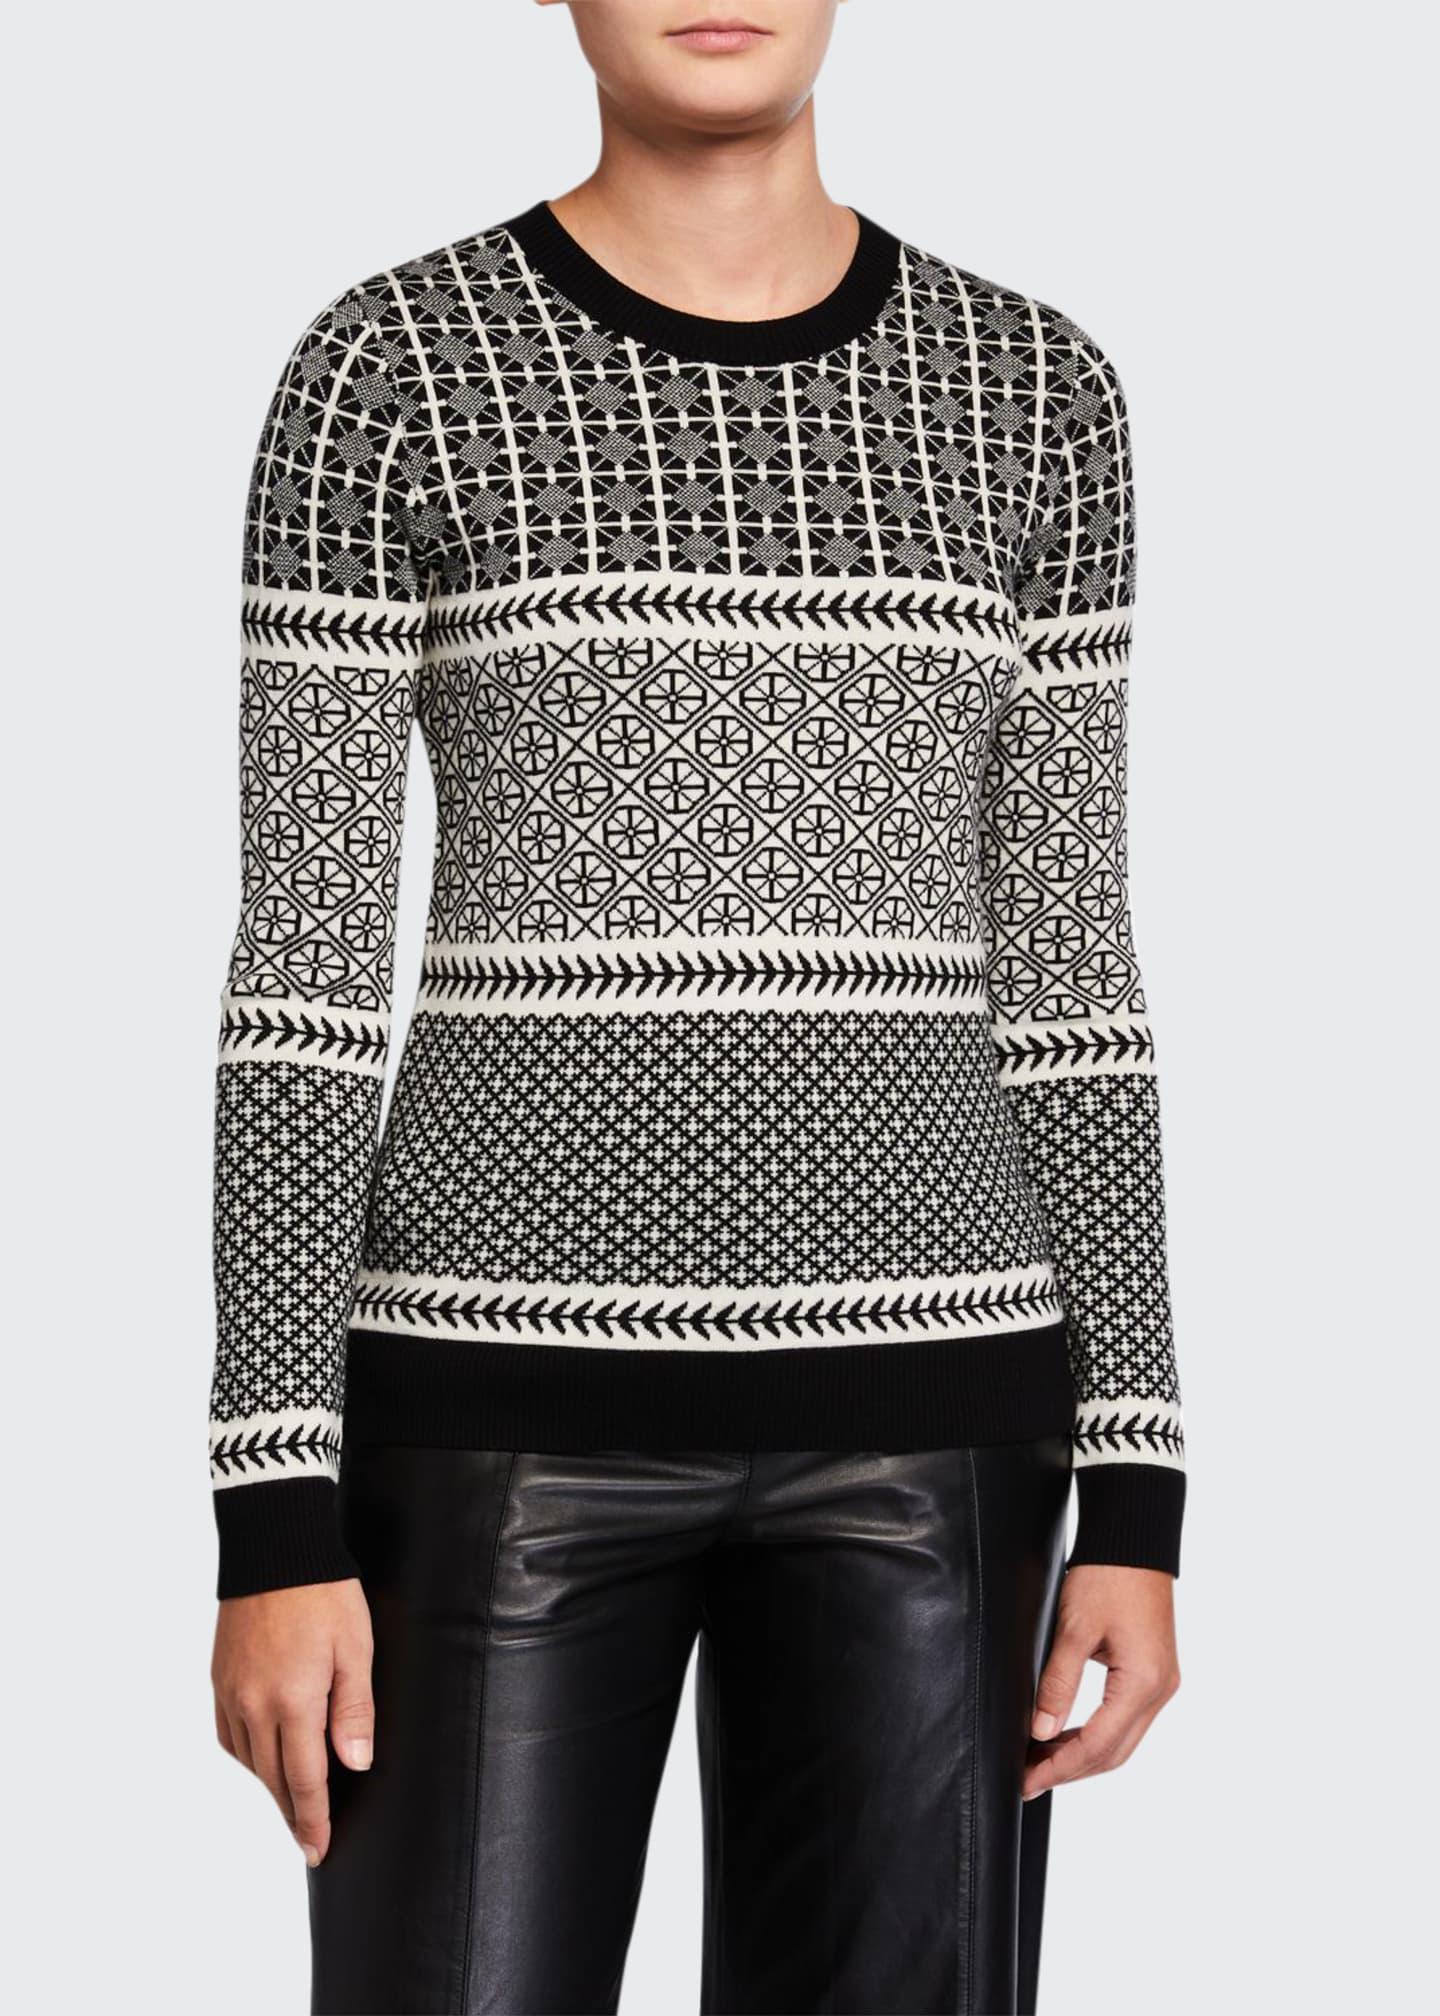 Jason Wu Graphic Fair Isle Crewneck Wool Sweater